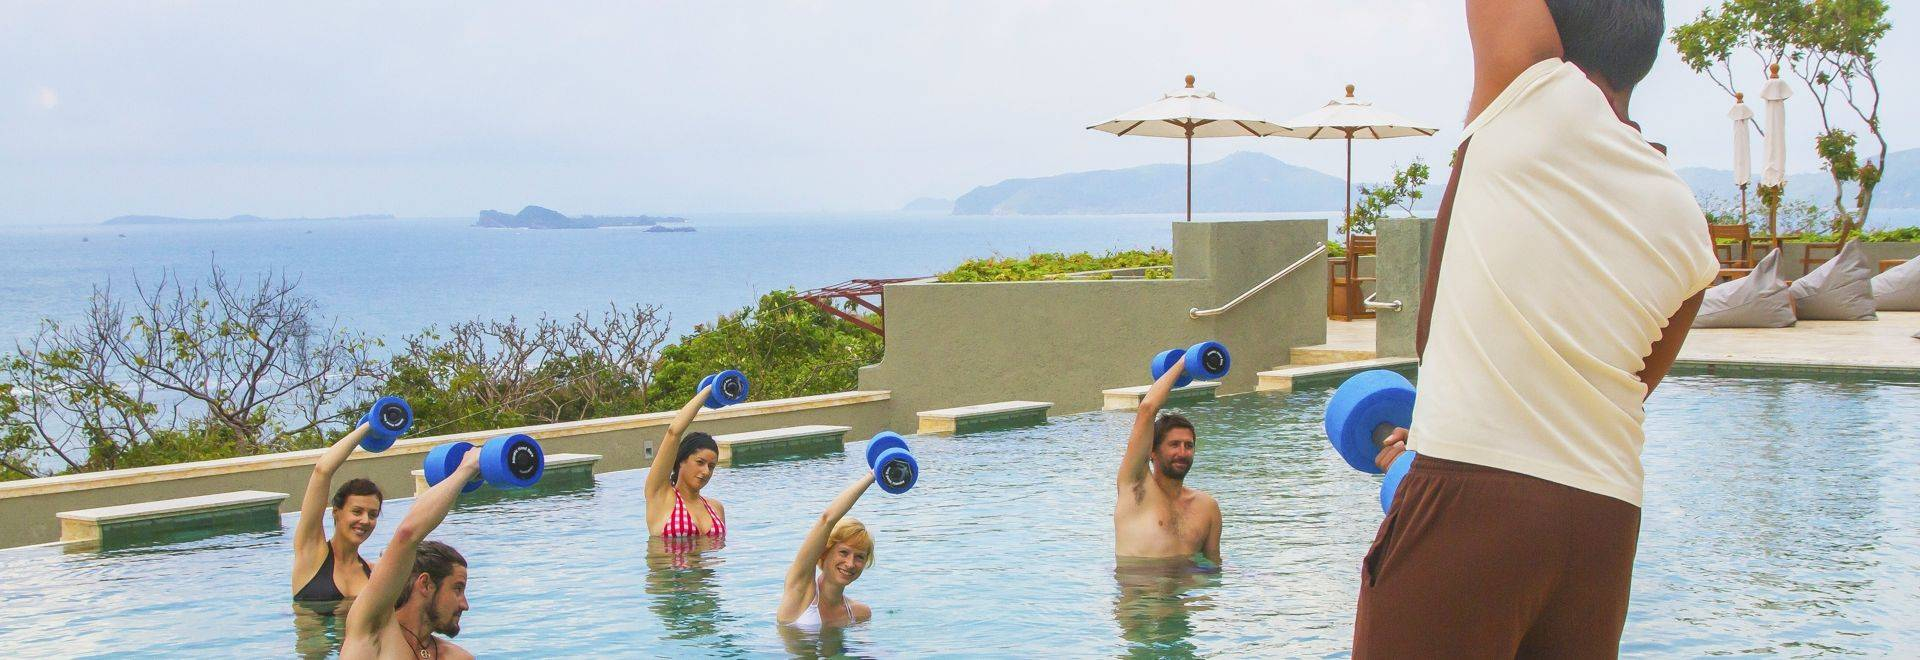 Kamalaya-pool-fitness.jpg